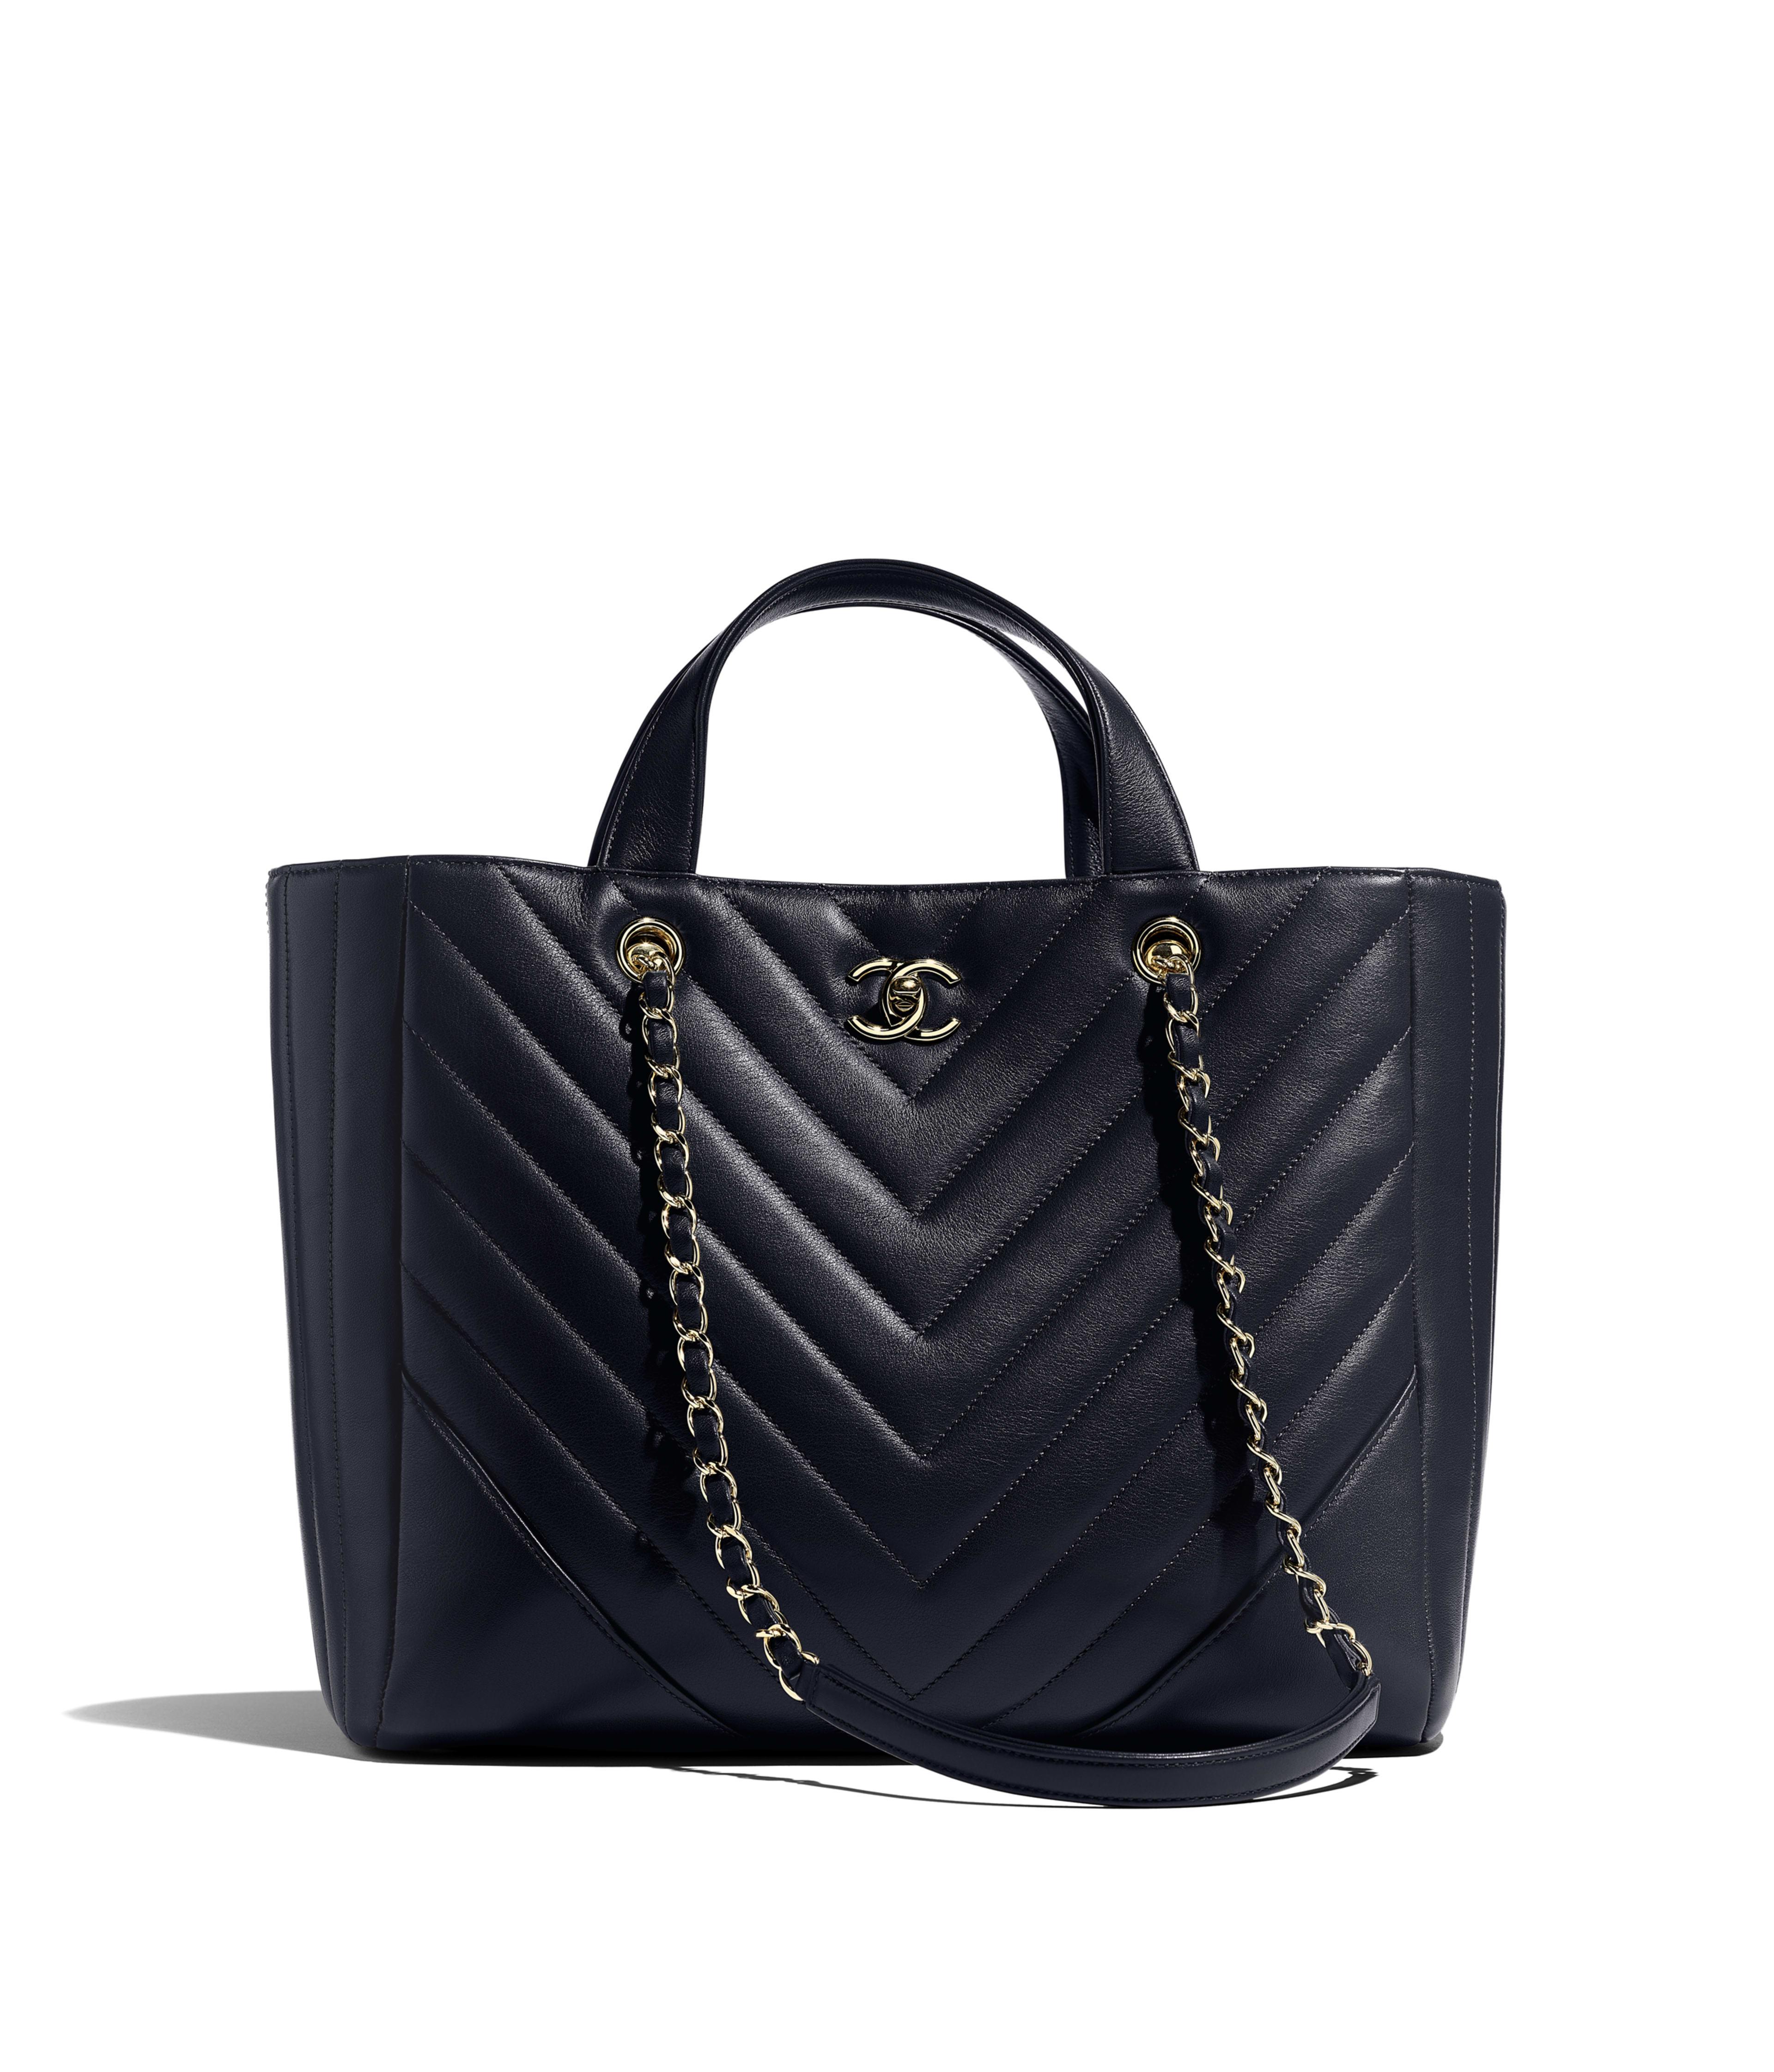 76ac6a48 Shopping Bags - Handbags | CHANEL